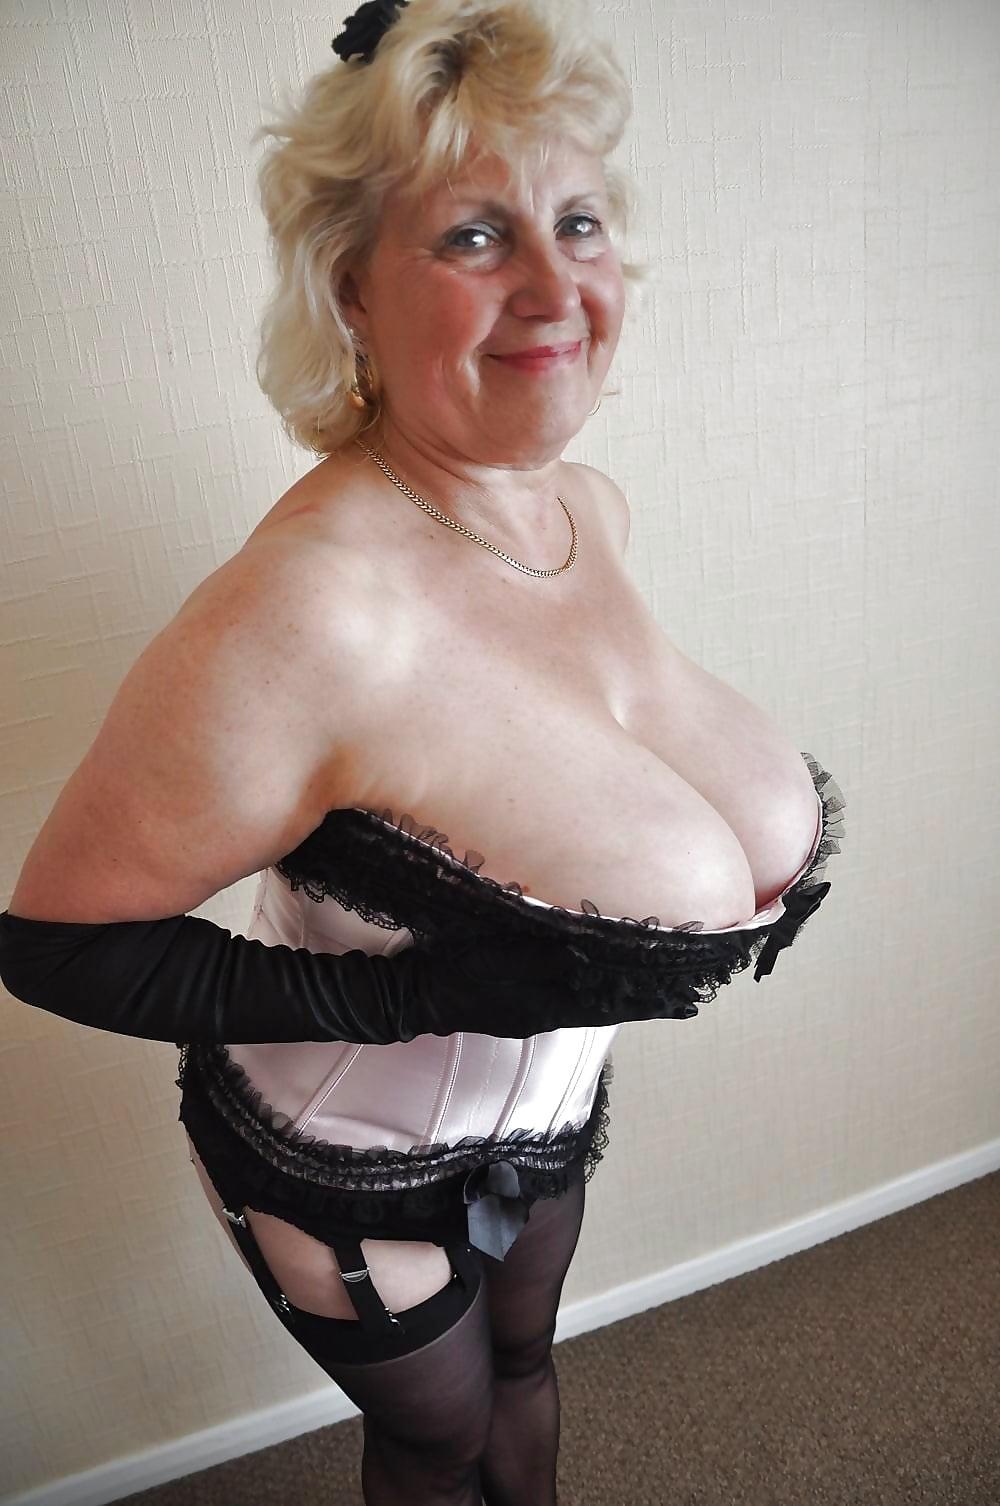 Euro granny pem lets her big old tits hang loose - 1 1